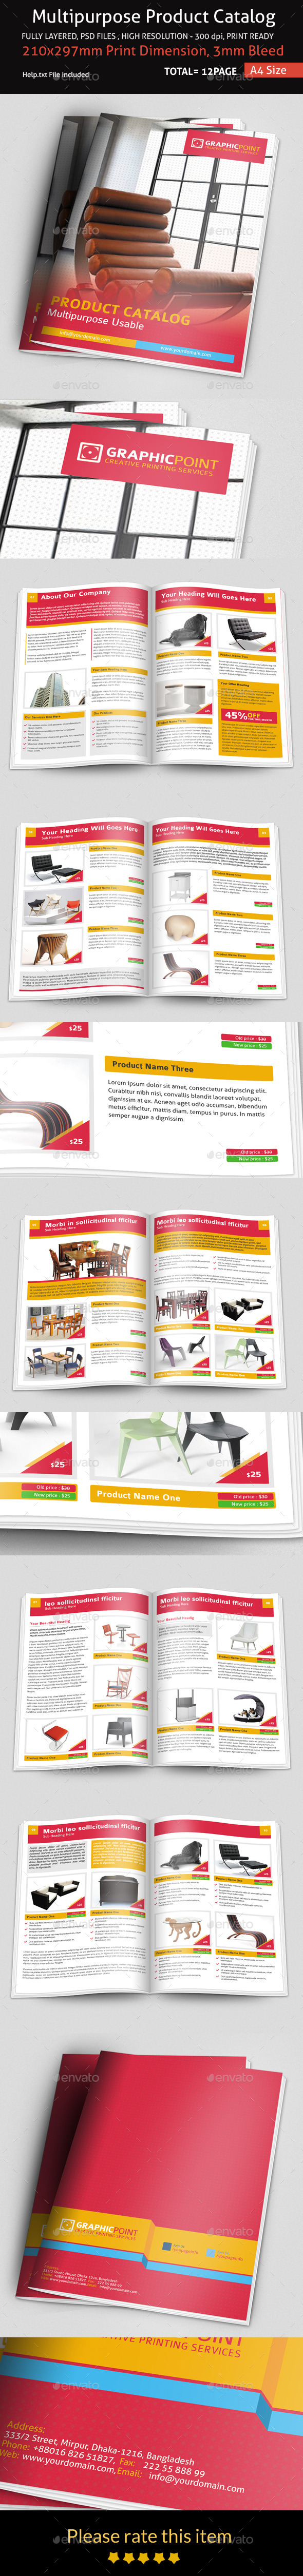 GraphicRiver Multipurpose Product Catalog 9033836